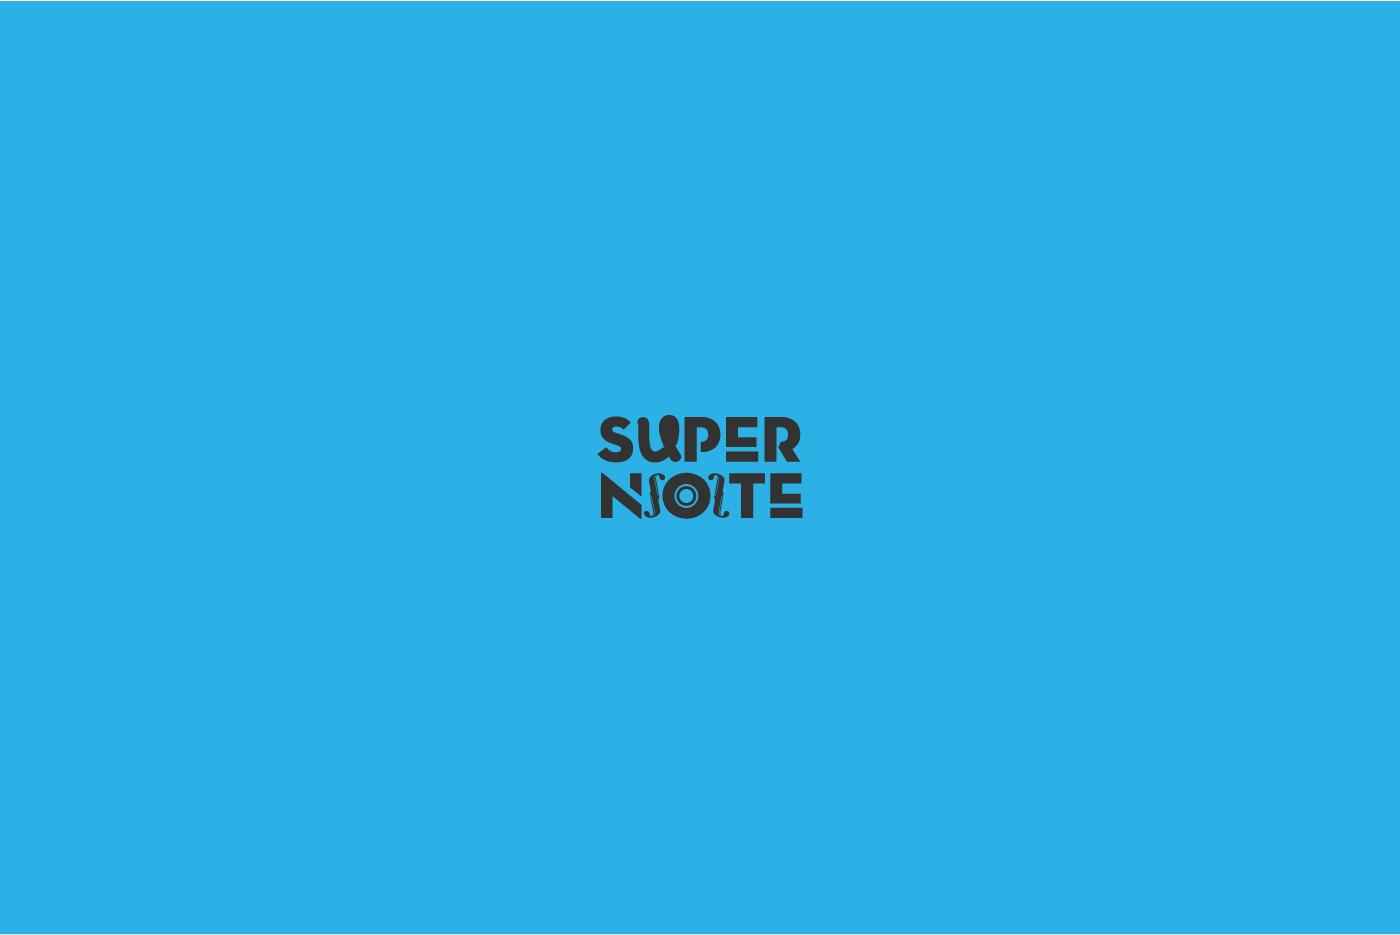 supernote-01